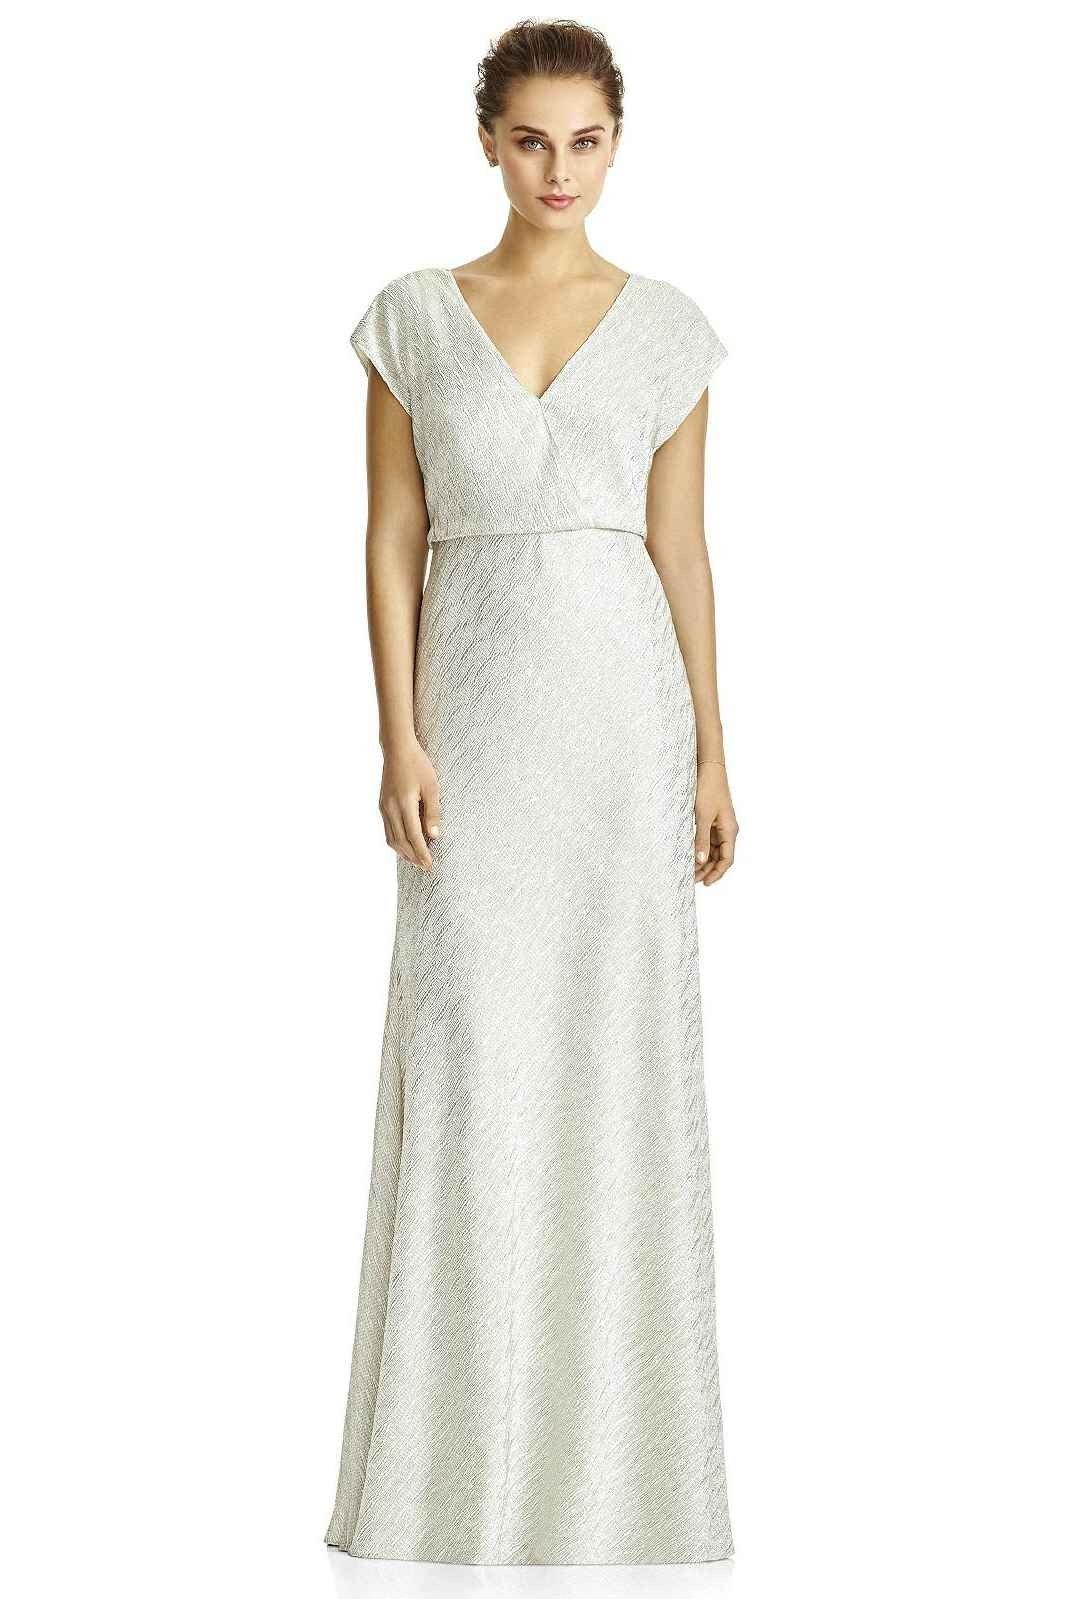 Jenny yoo bridesmaids dress style jy525 perfect bridal jy jenny yoo bridesmaids dress style jy525 perfect bridal ombrellifo Choice Image